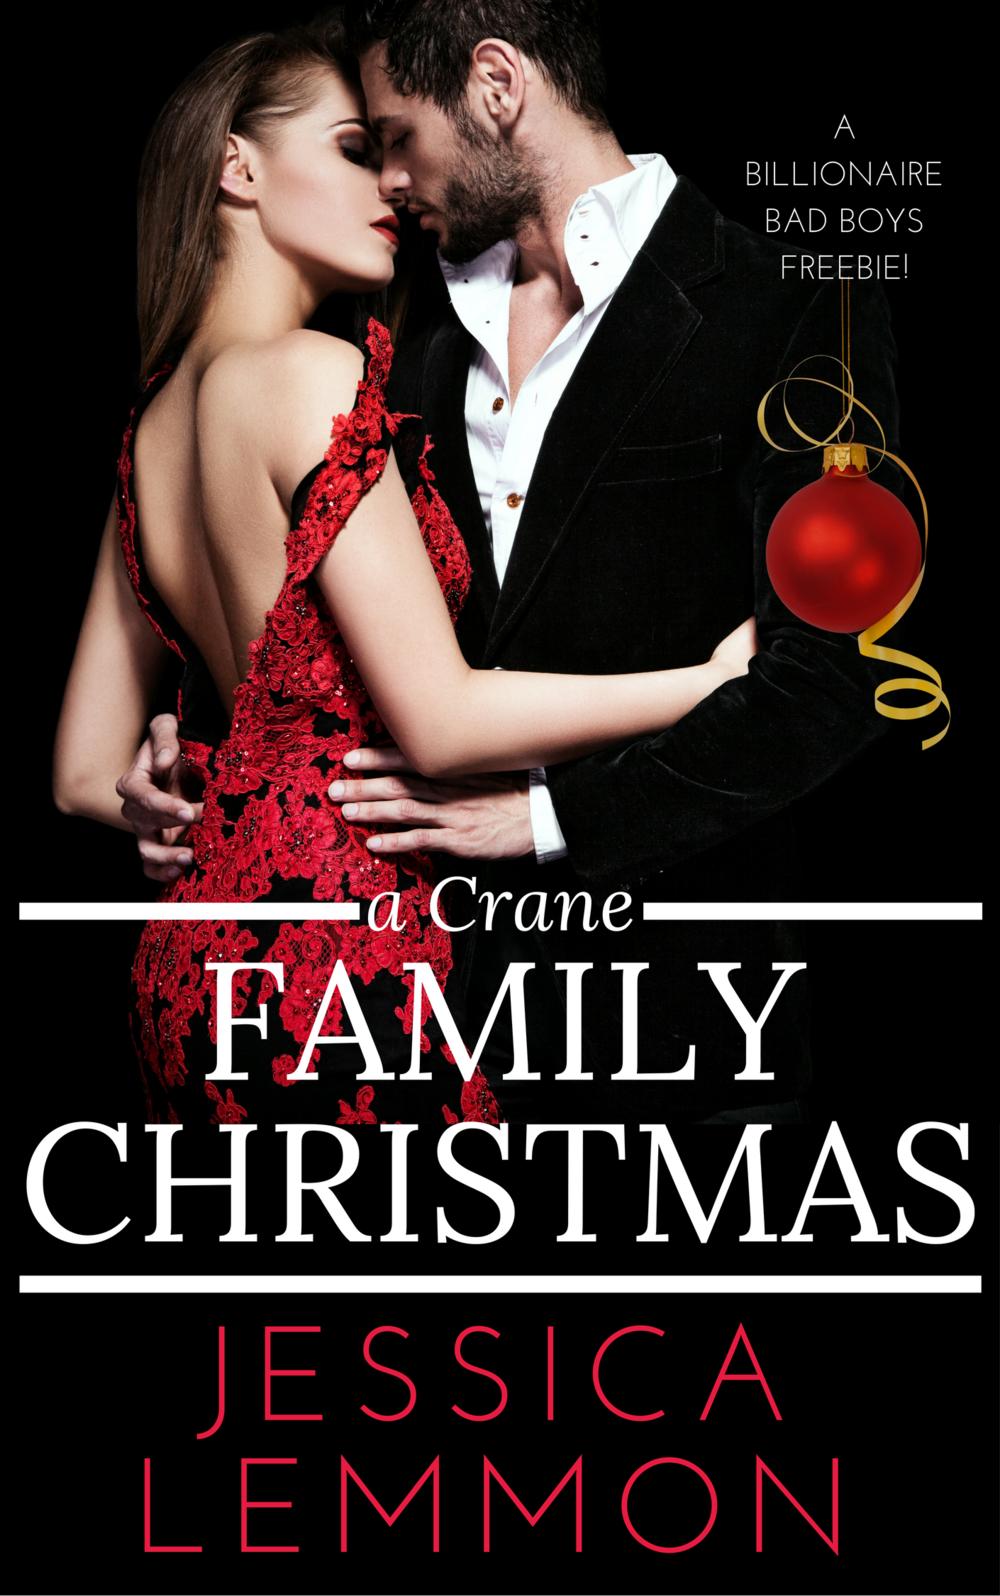 A-Crane-Family-Christmas.png